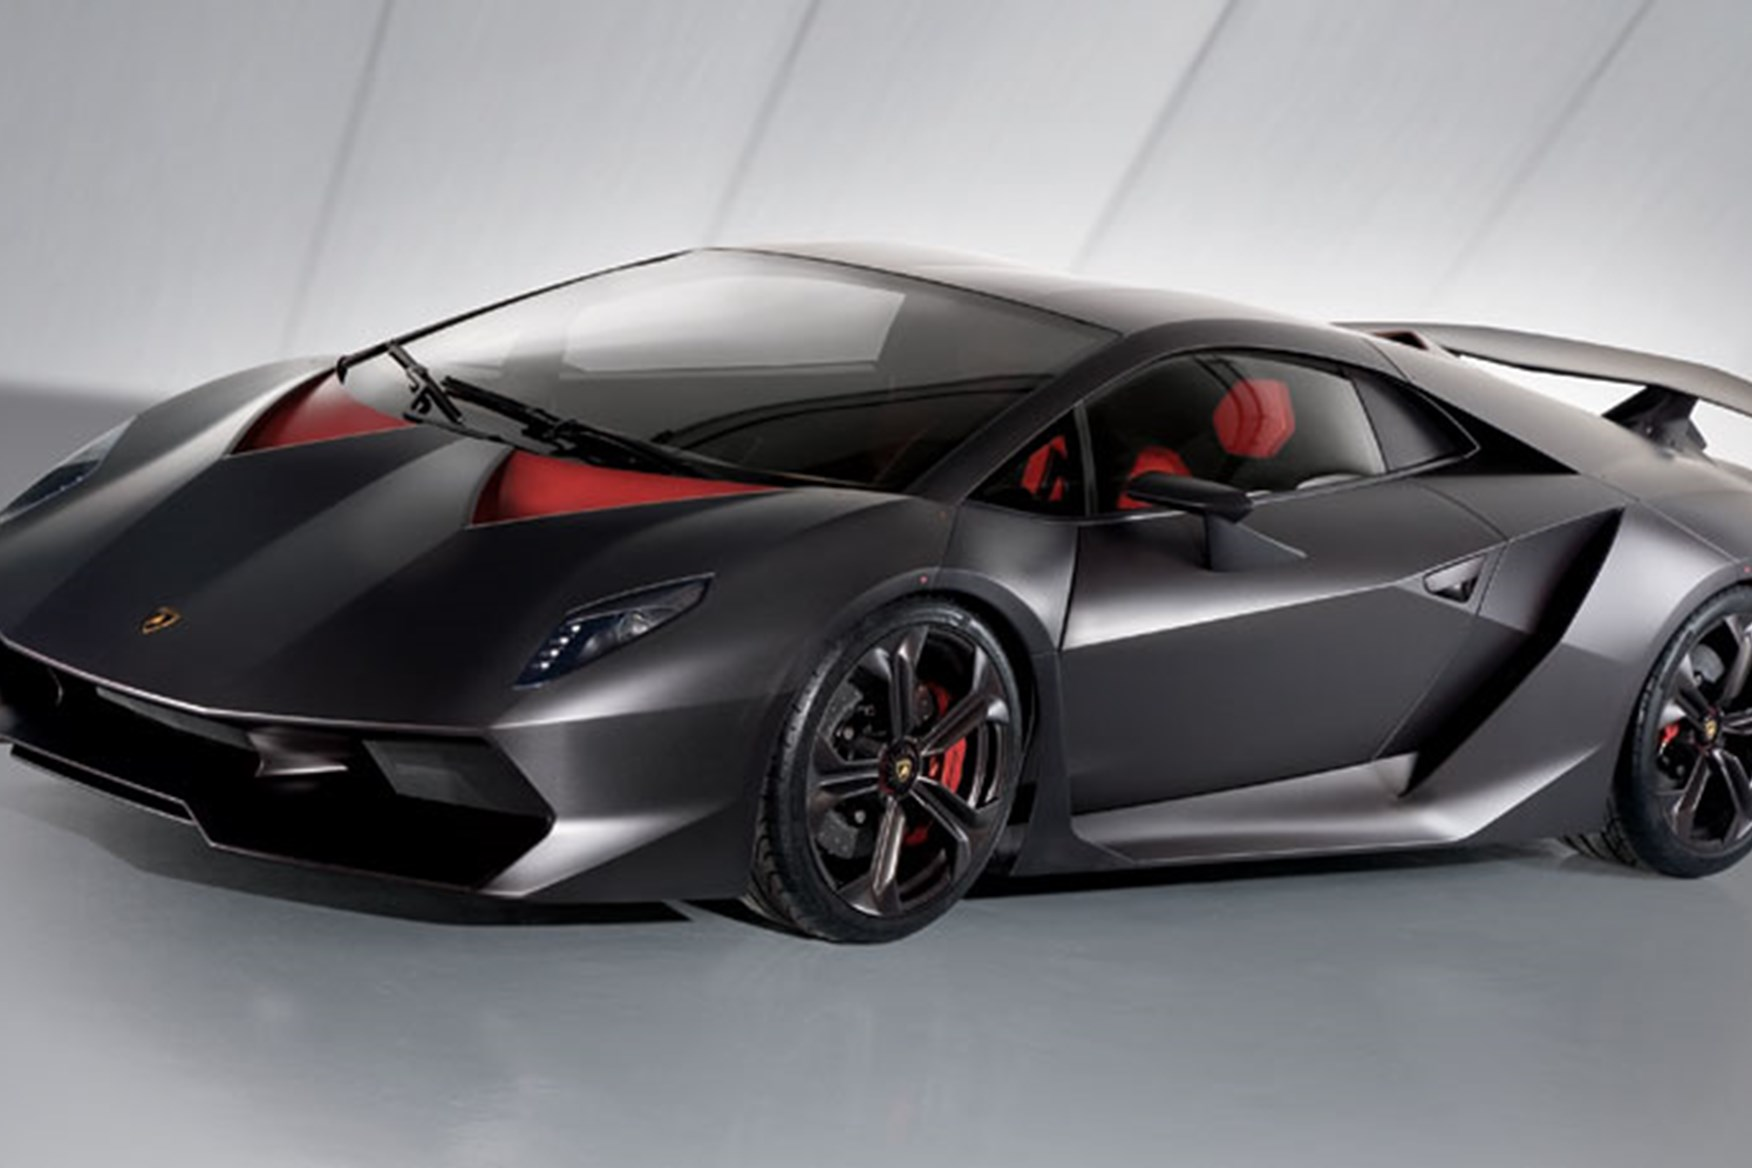 Bon Lamborghini Sesto Elemento (2010): The All Carbonfibre Concept Car By CAR  Magazine